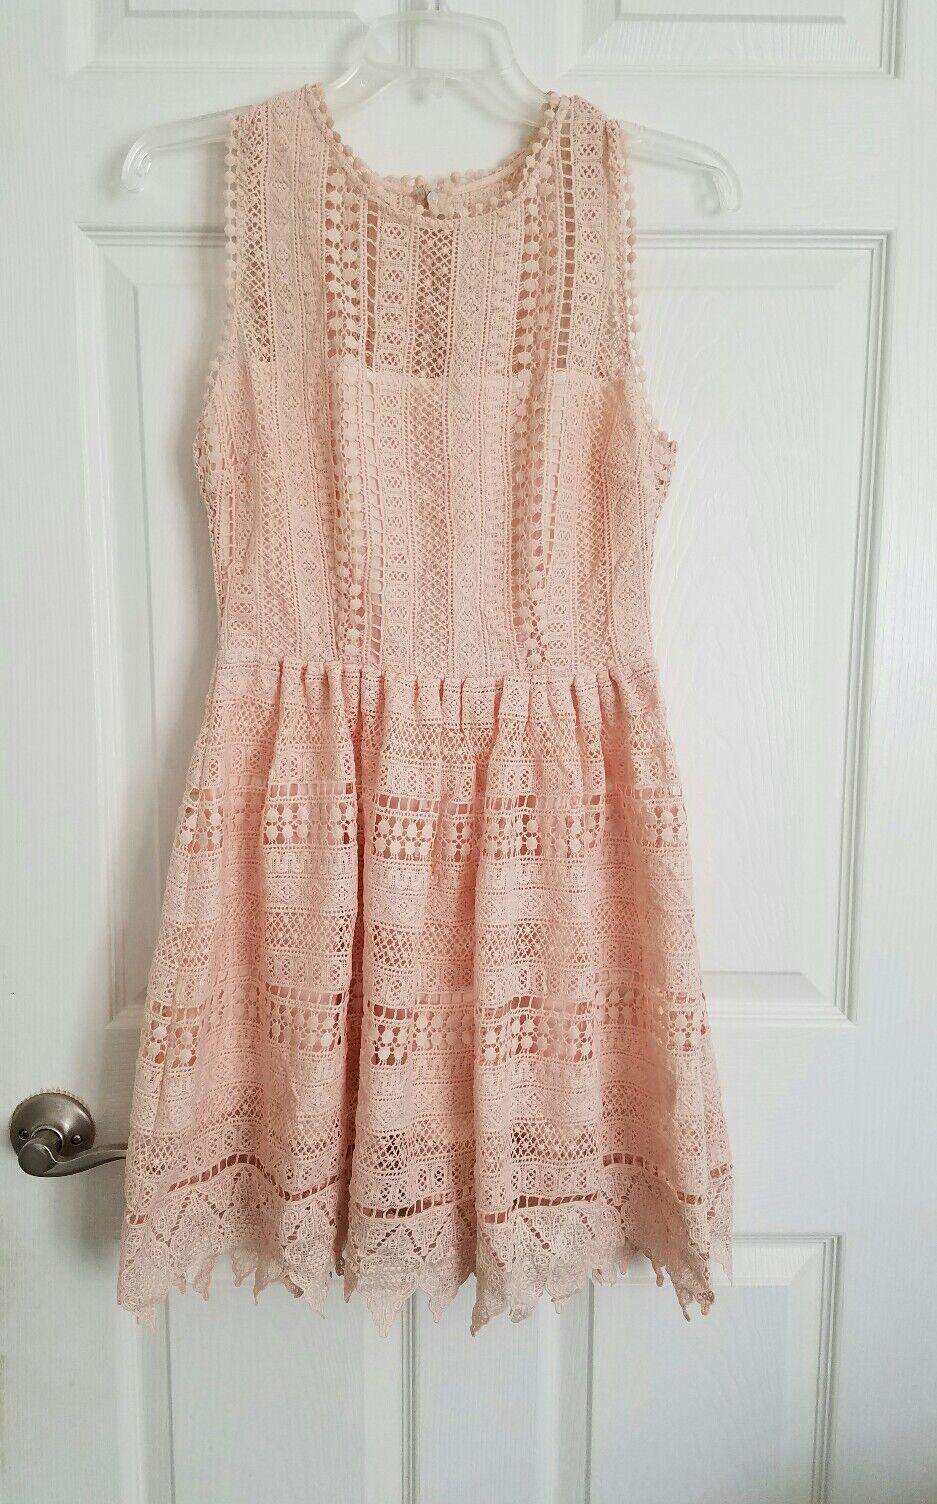 BB Dakota Elissa Peach Bossom Sleeveless Crochet Lace Summer Dress Sz 2 NWT